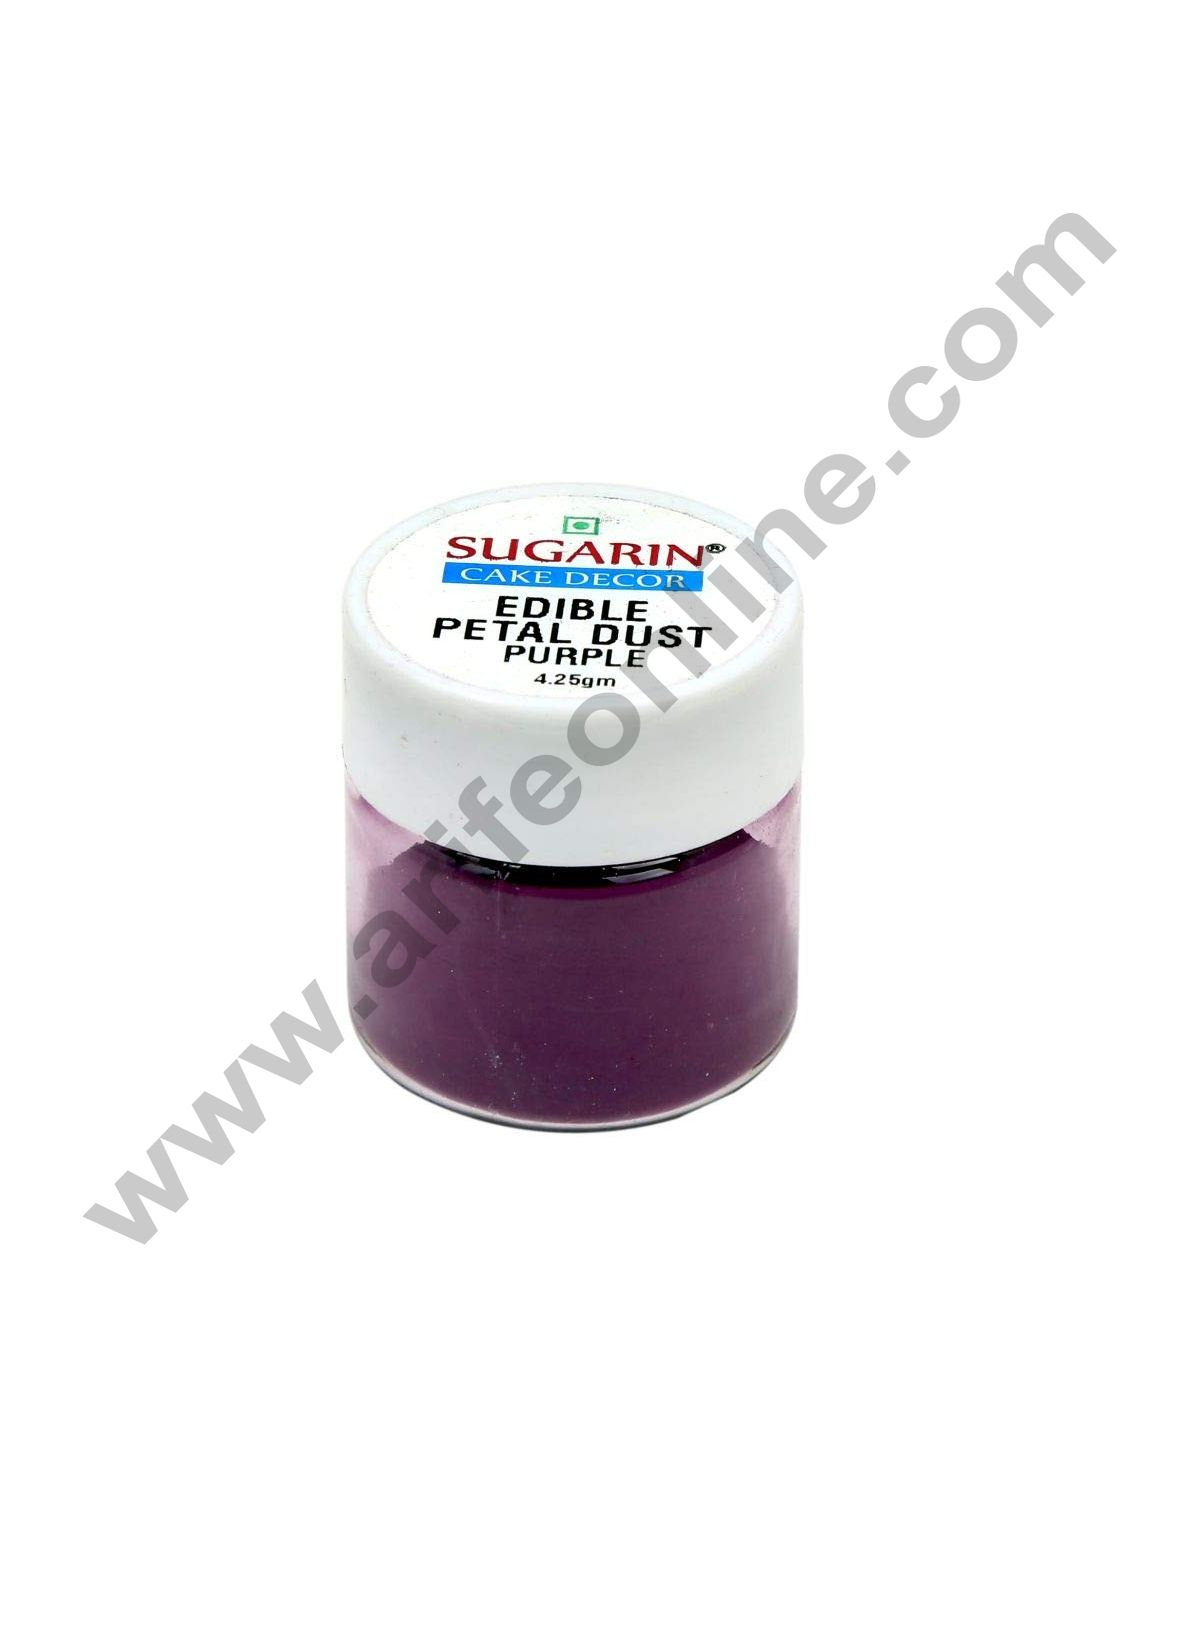 Sugarin Edible Petal Dust, Purple, 4.25gm